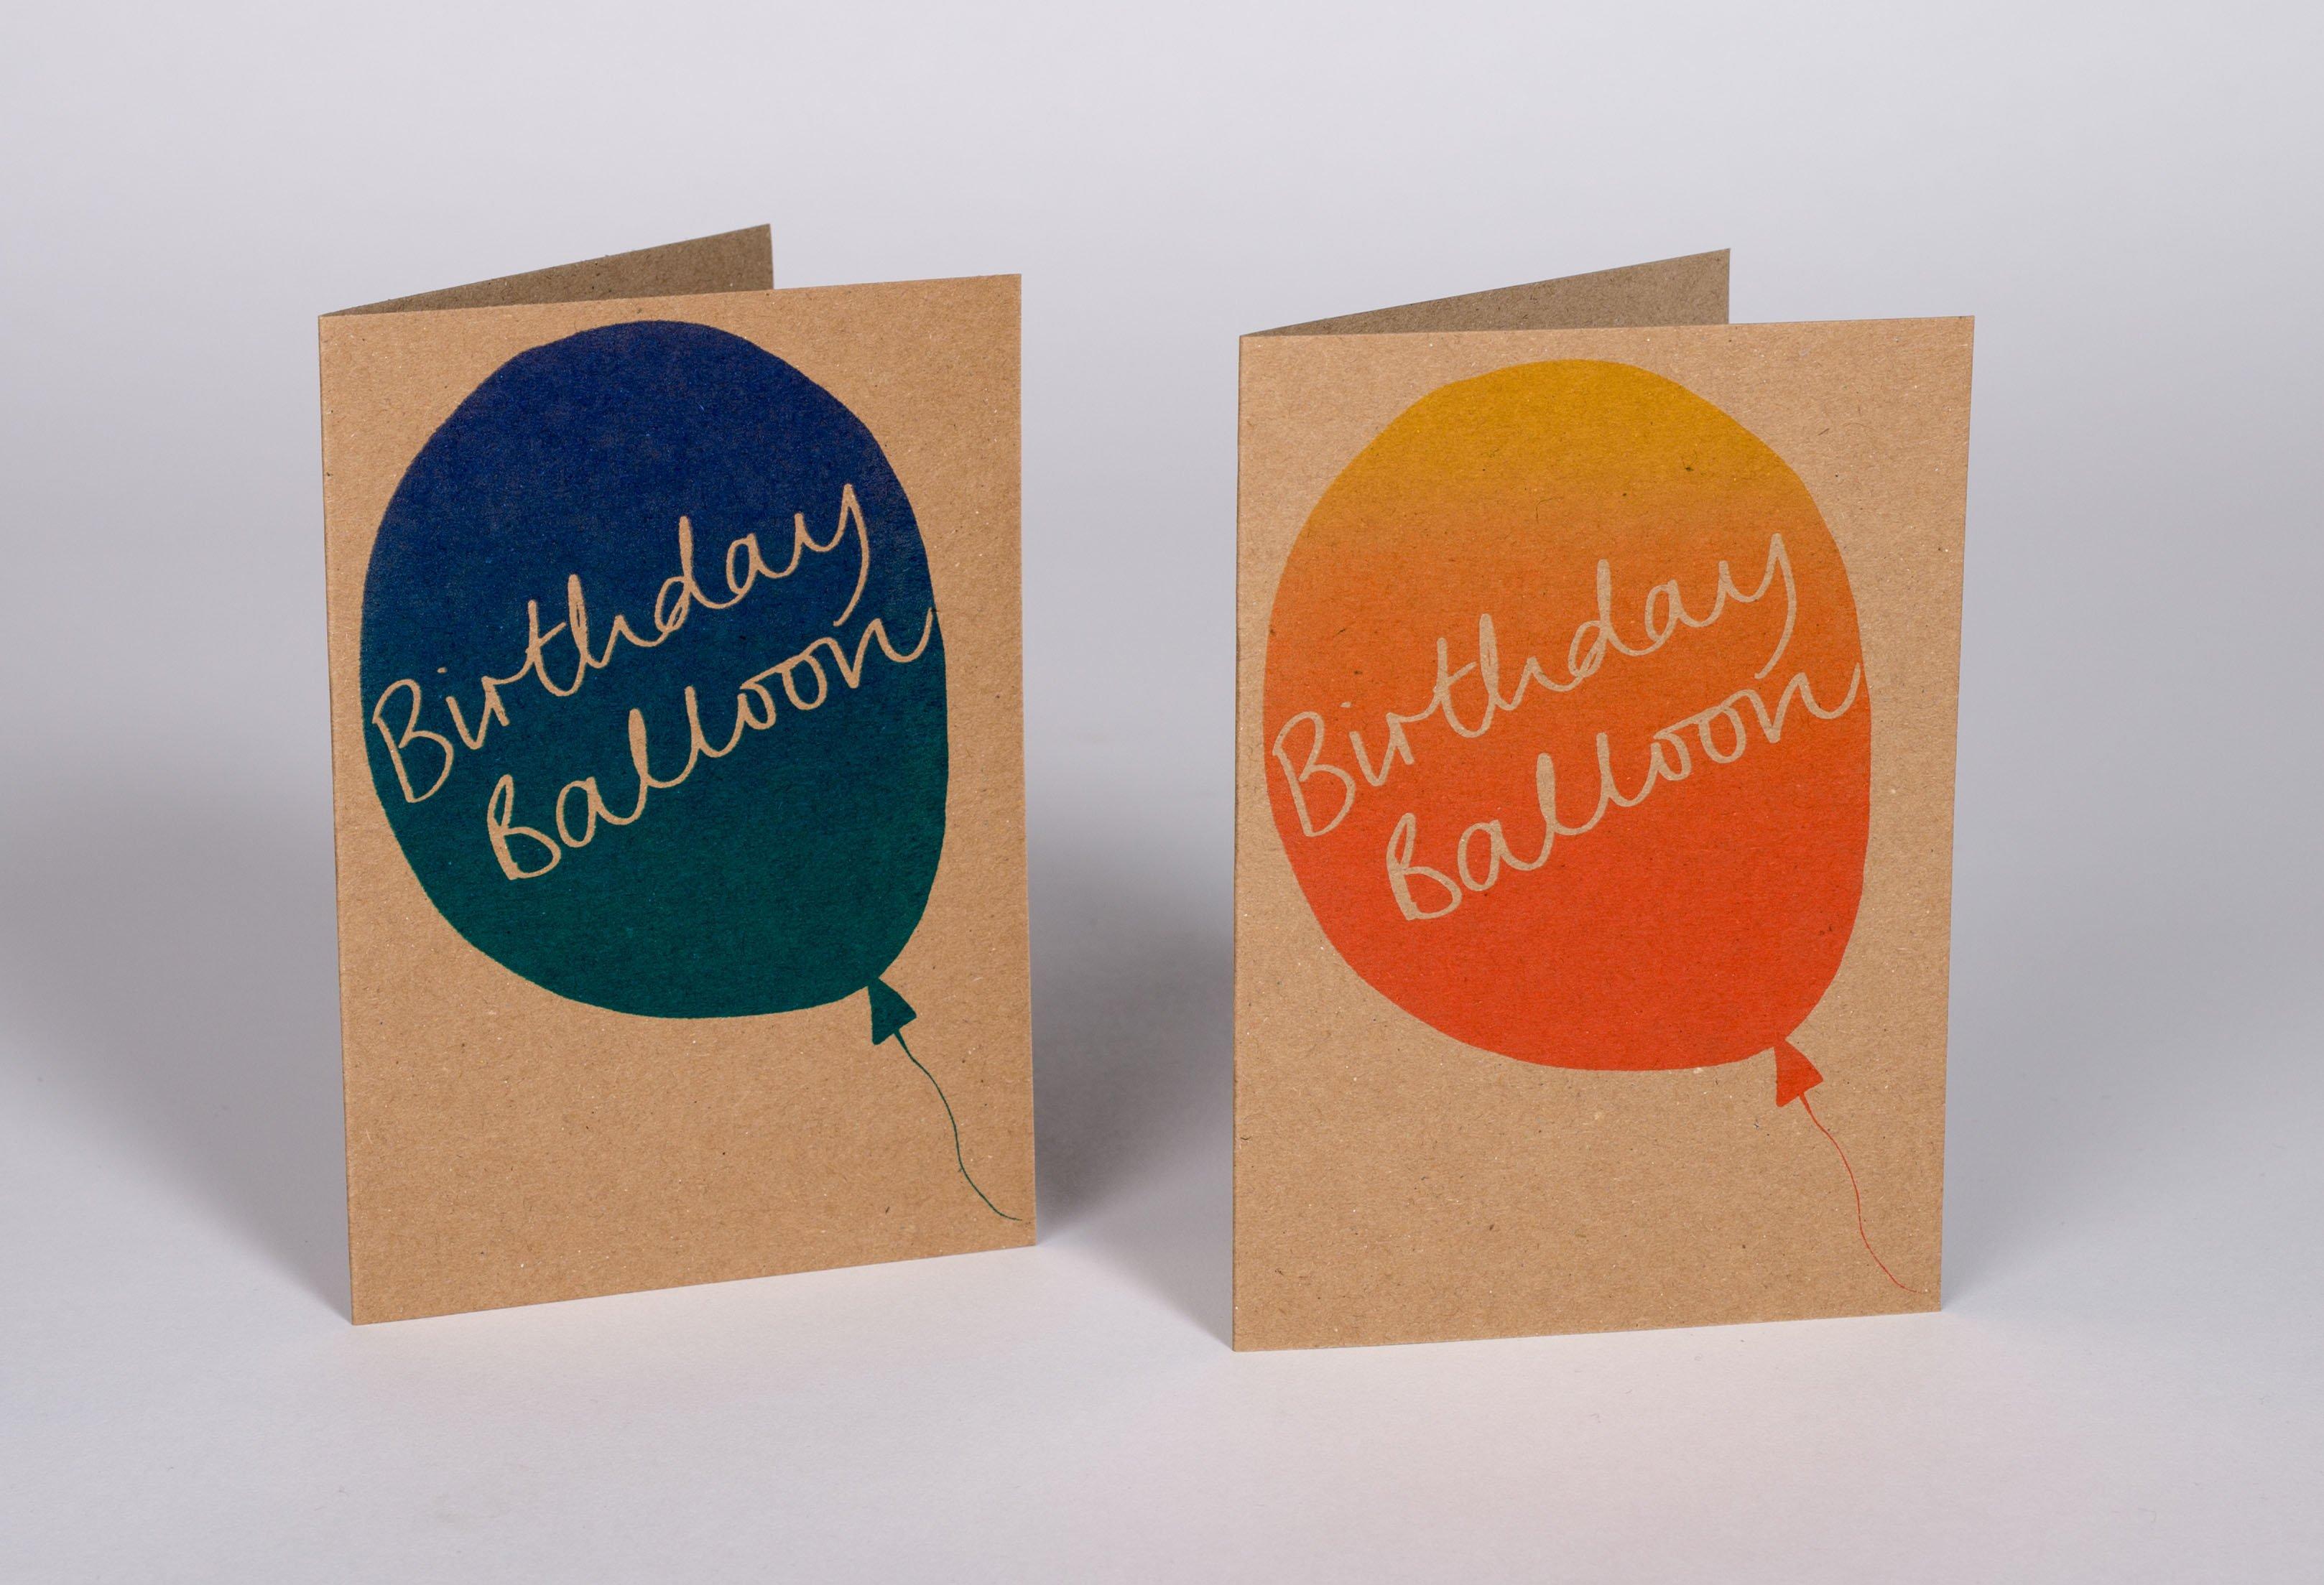 Birthday balloon greeting card kirstie williams designer maker birthday balloon greeting card kirstie williams designer maker screen printer m4hsunfo